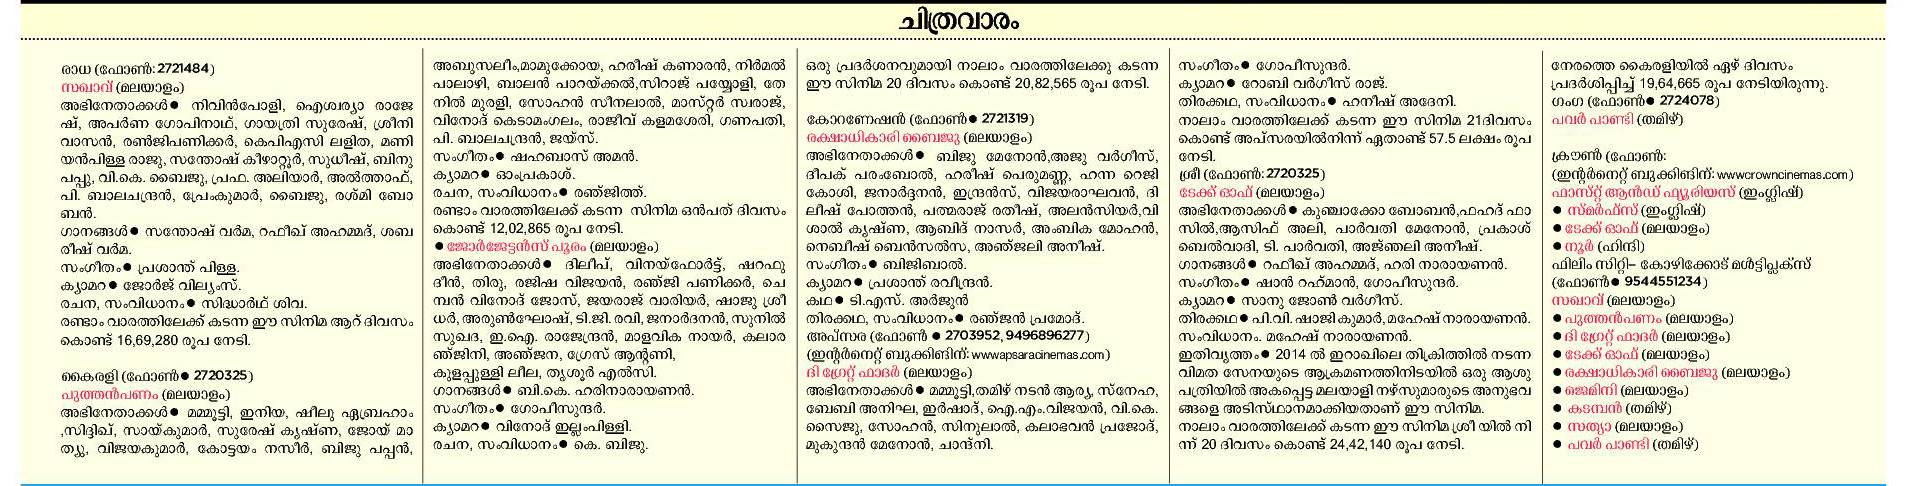 Malayalam new film box office result : Regarder le film